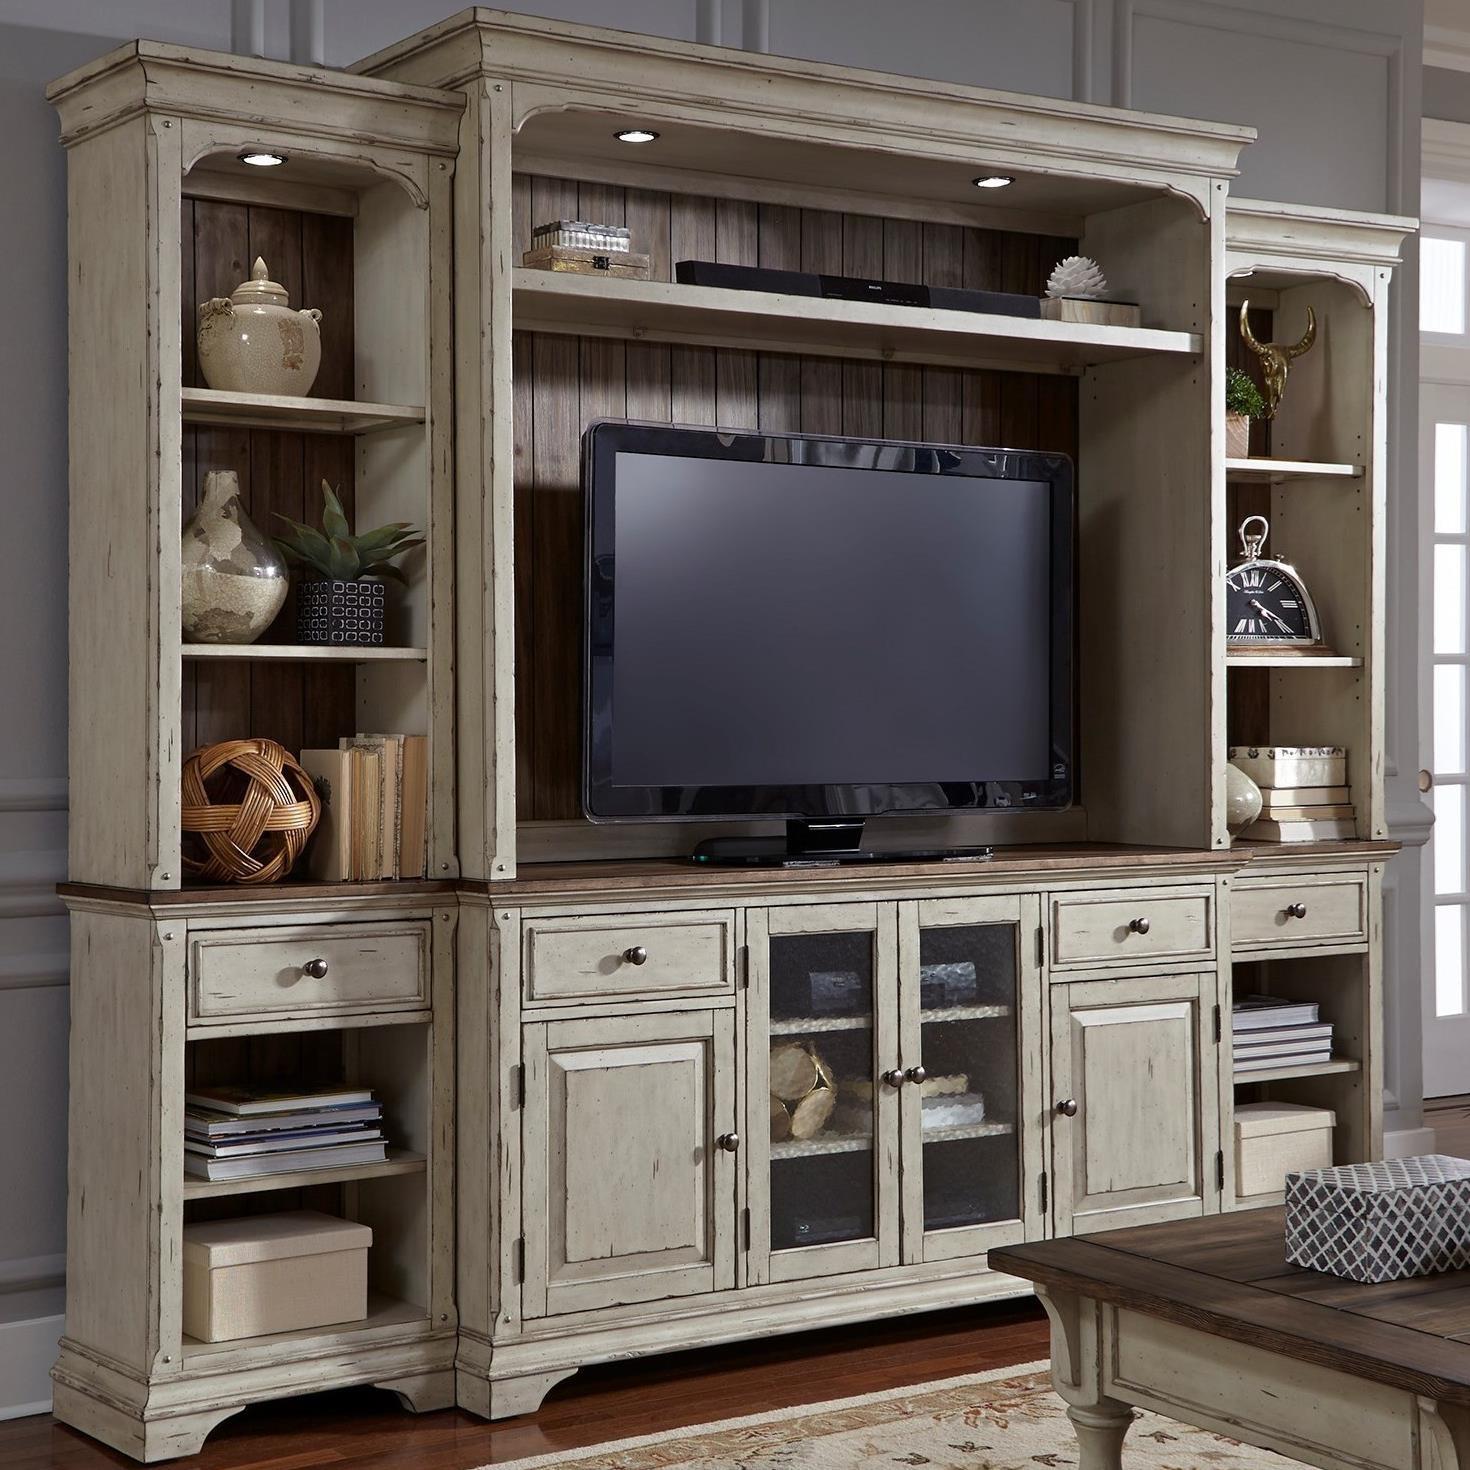 Liberty Furniture Morgan Creek 498 Entw Ecp Entertainment